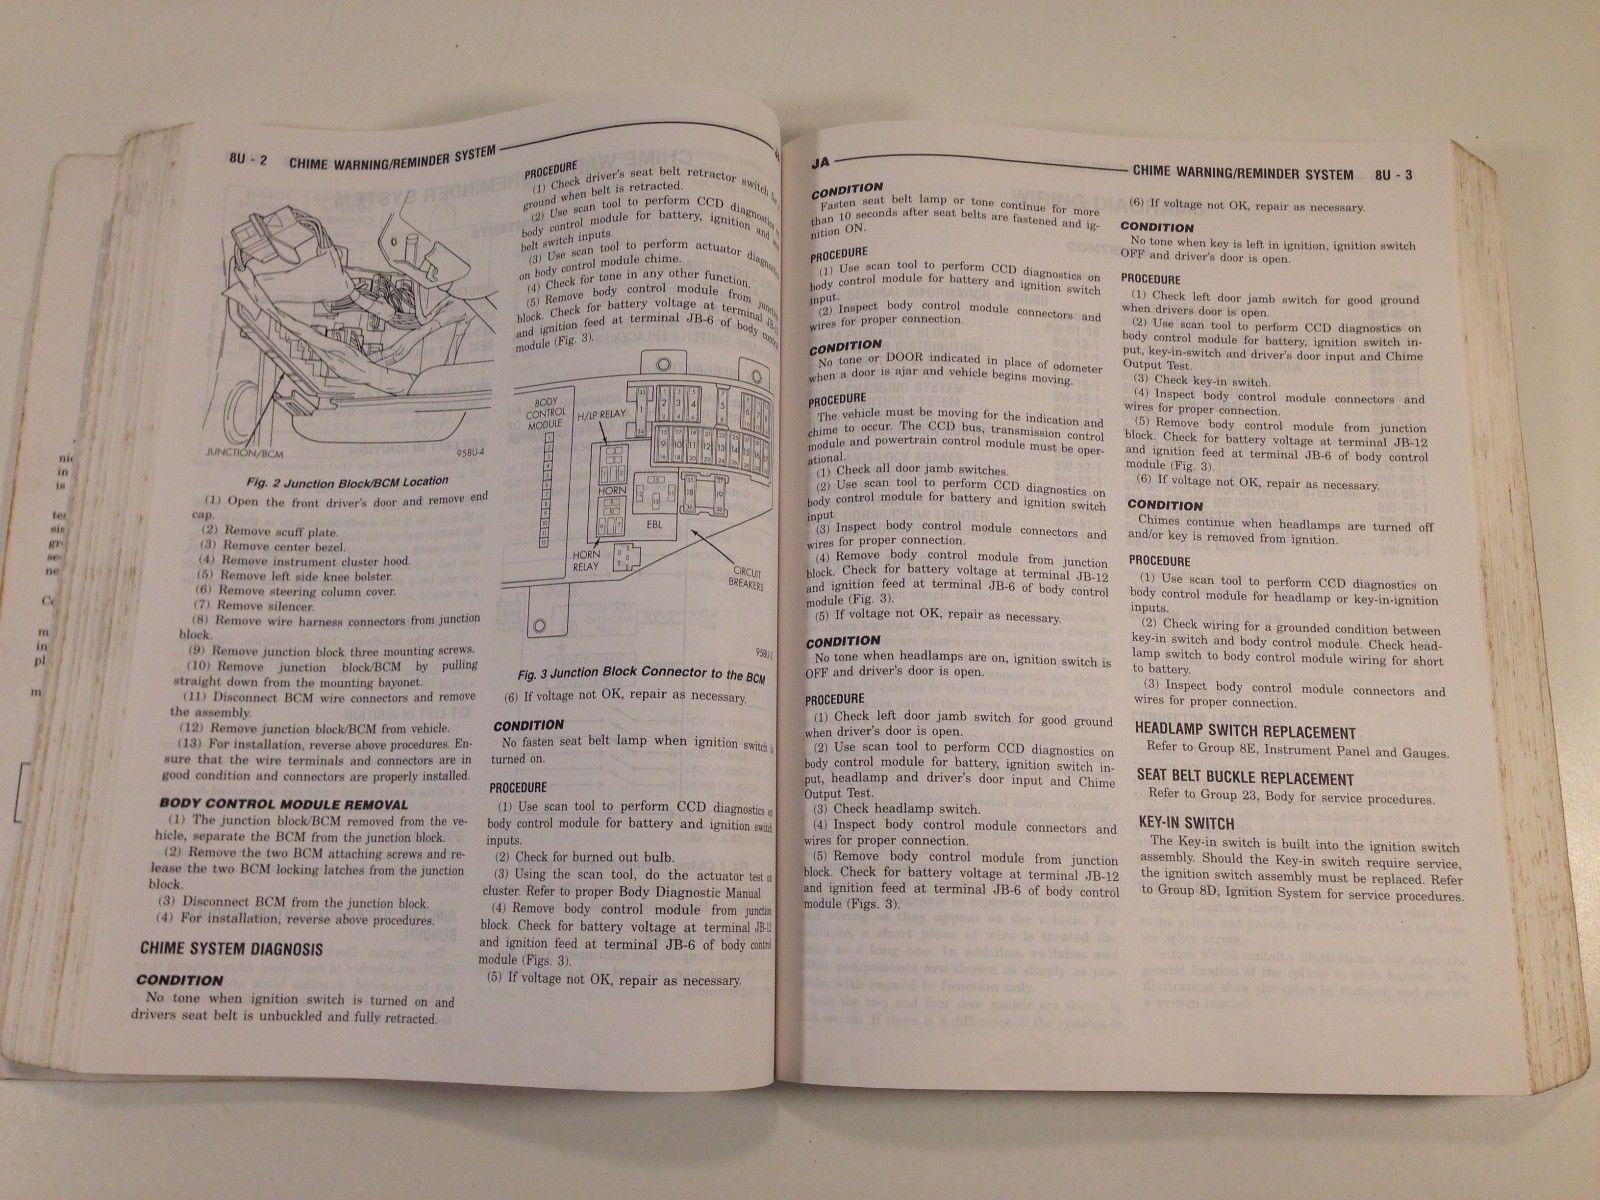 1995 Chrysler Dodge Cirrus Stratus Service Manual 81-270-5121 OEM Original